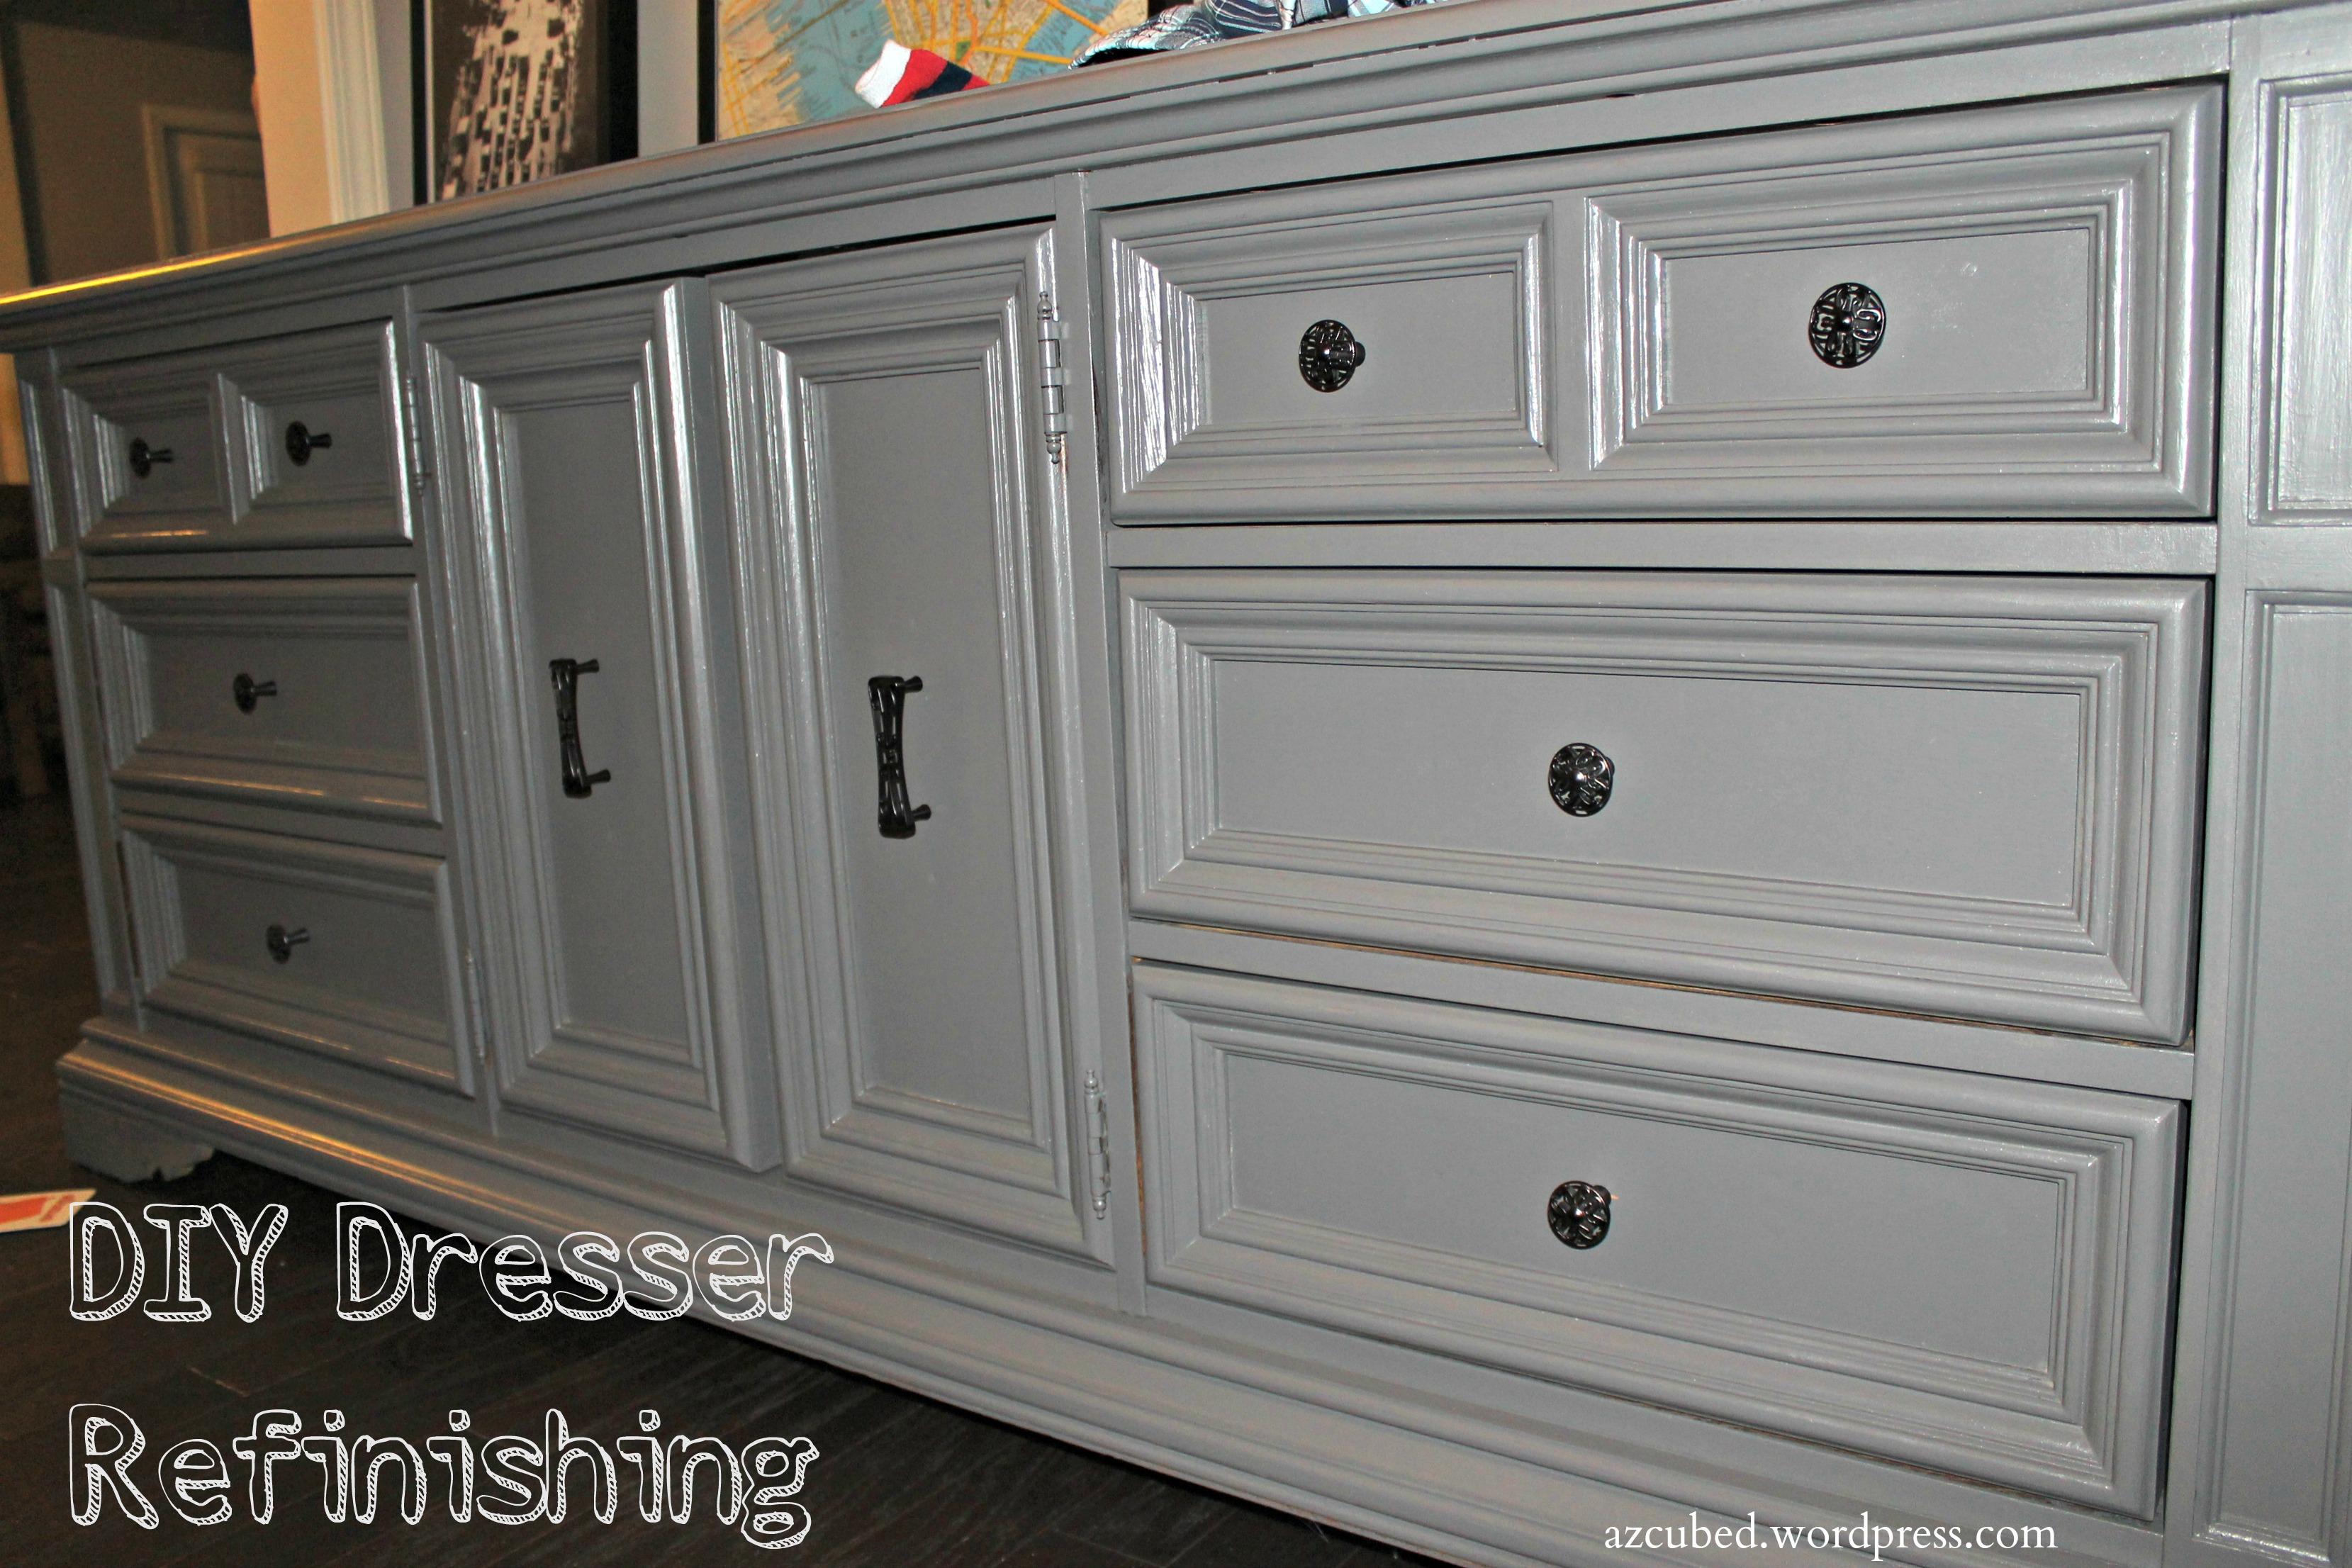 DIY Dresser Refinishing!  Domestic Superhero